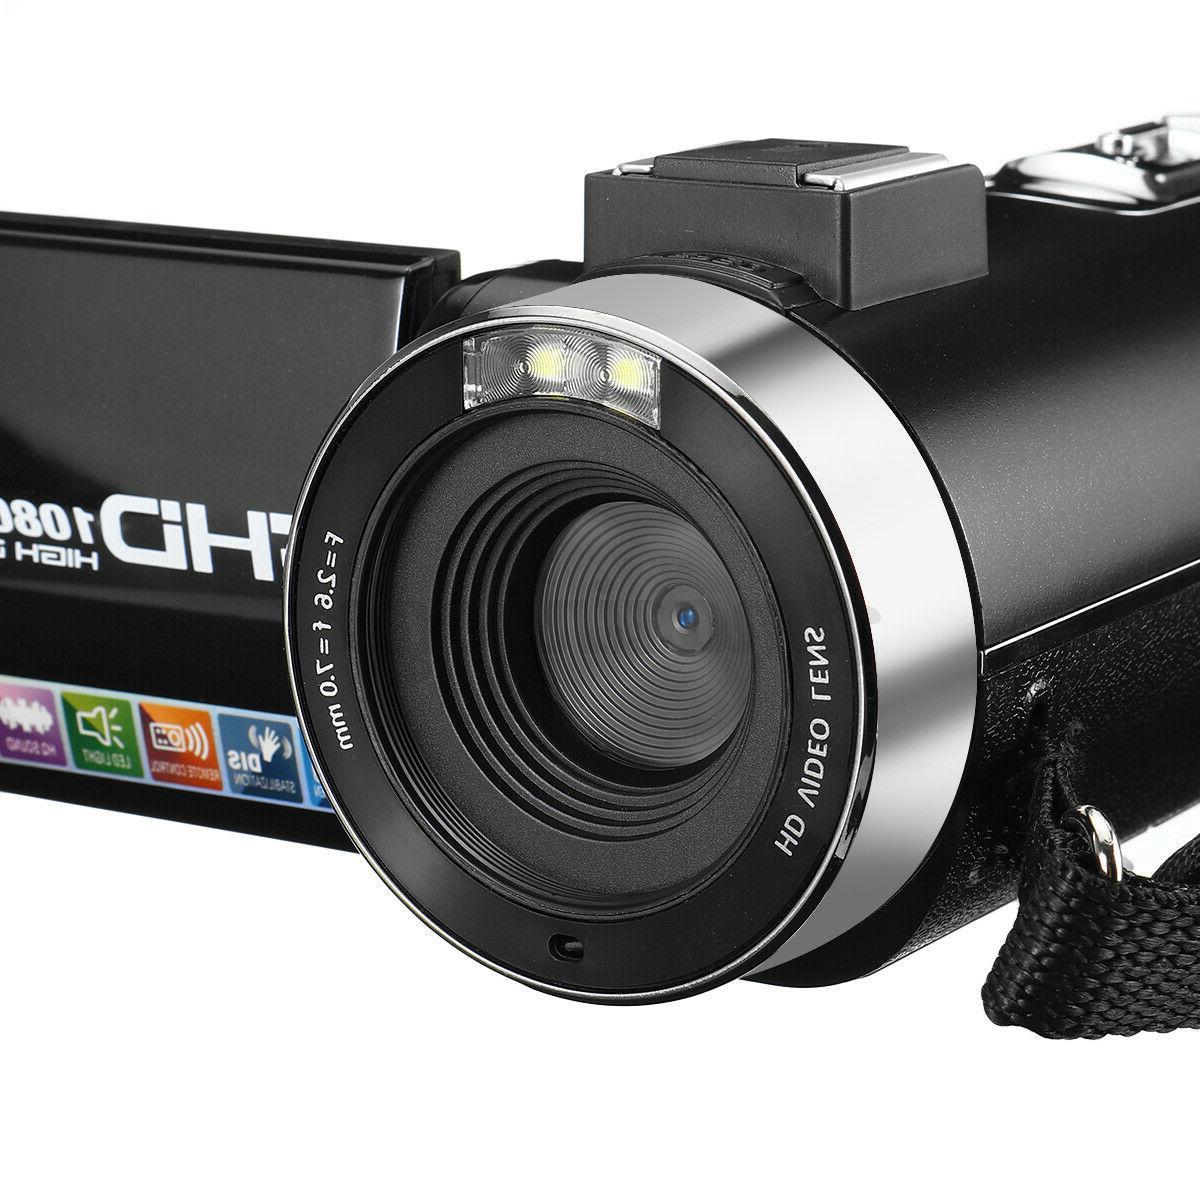 Full 1080P Video Camcorder Camera YouTube Set